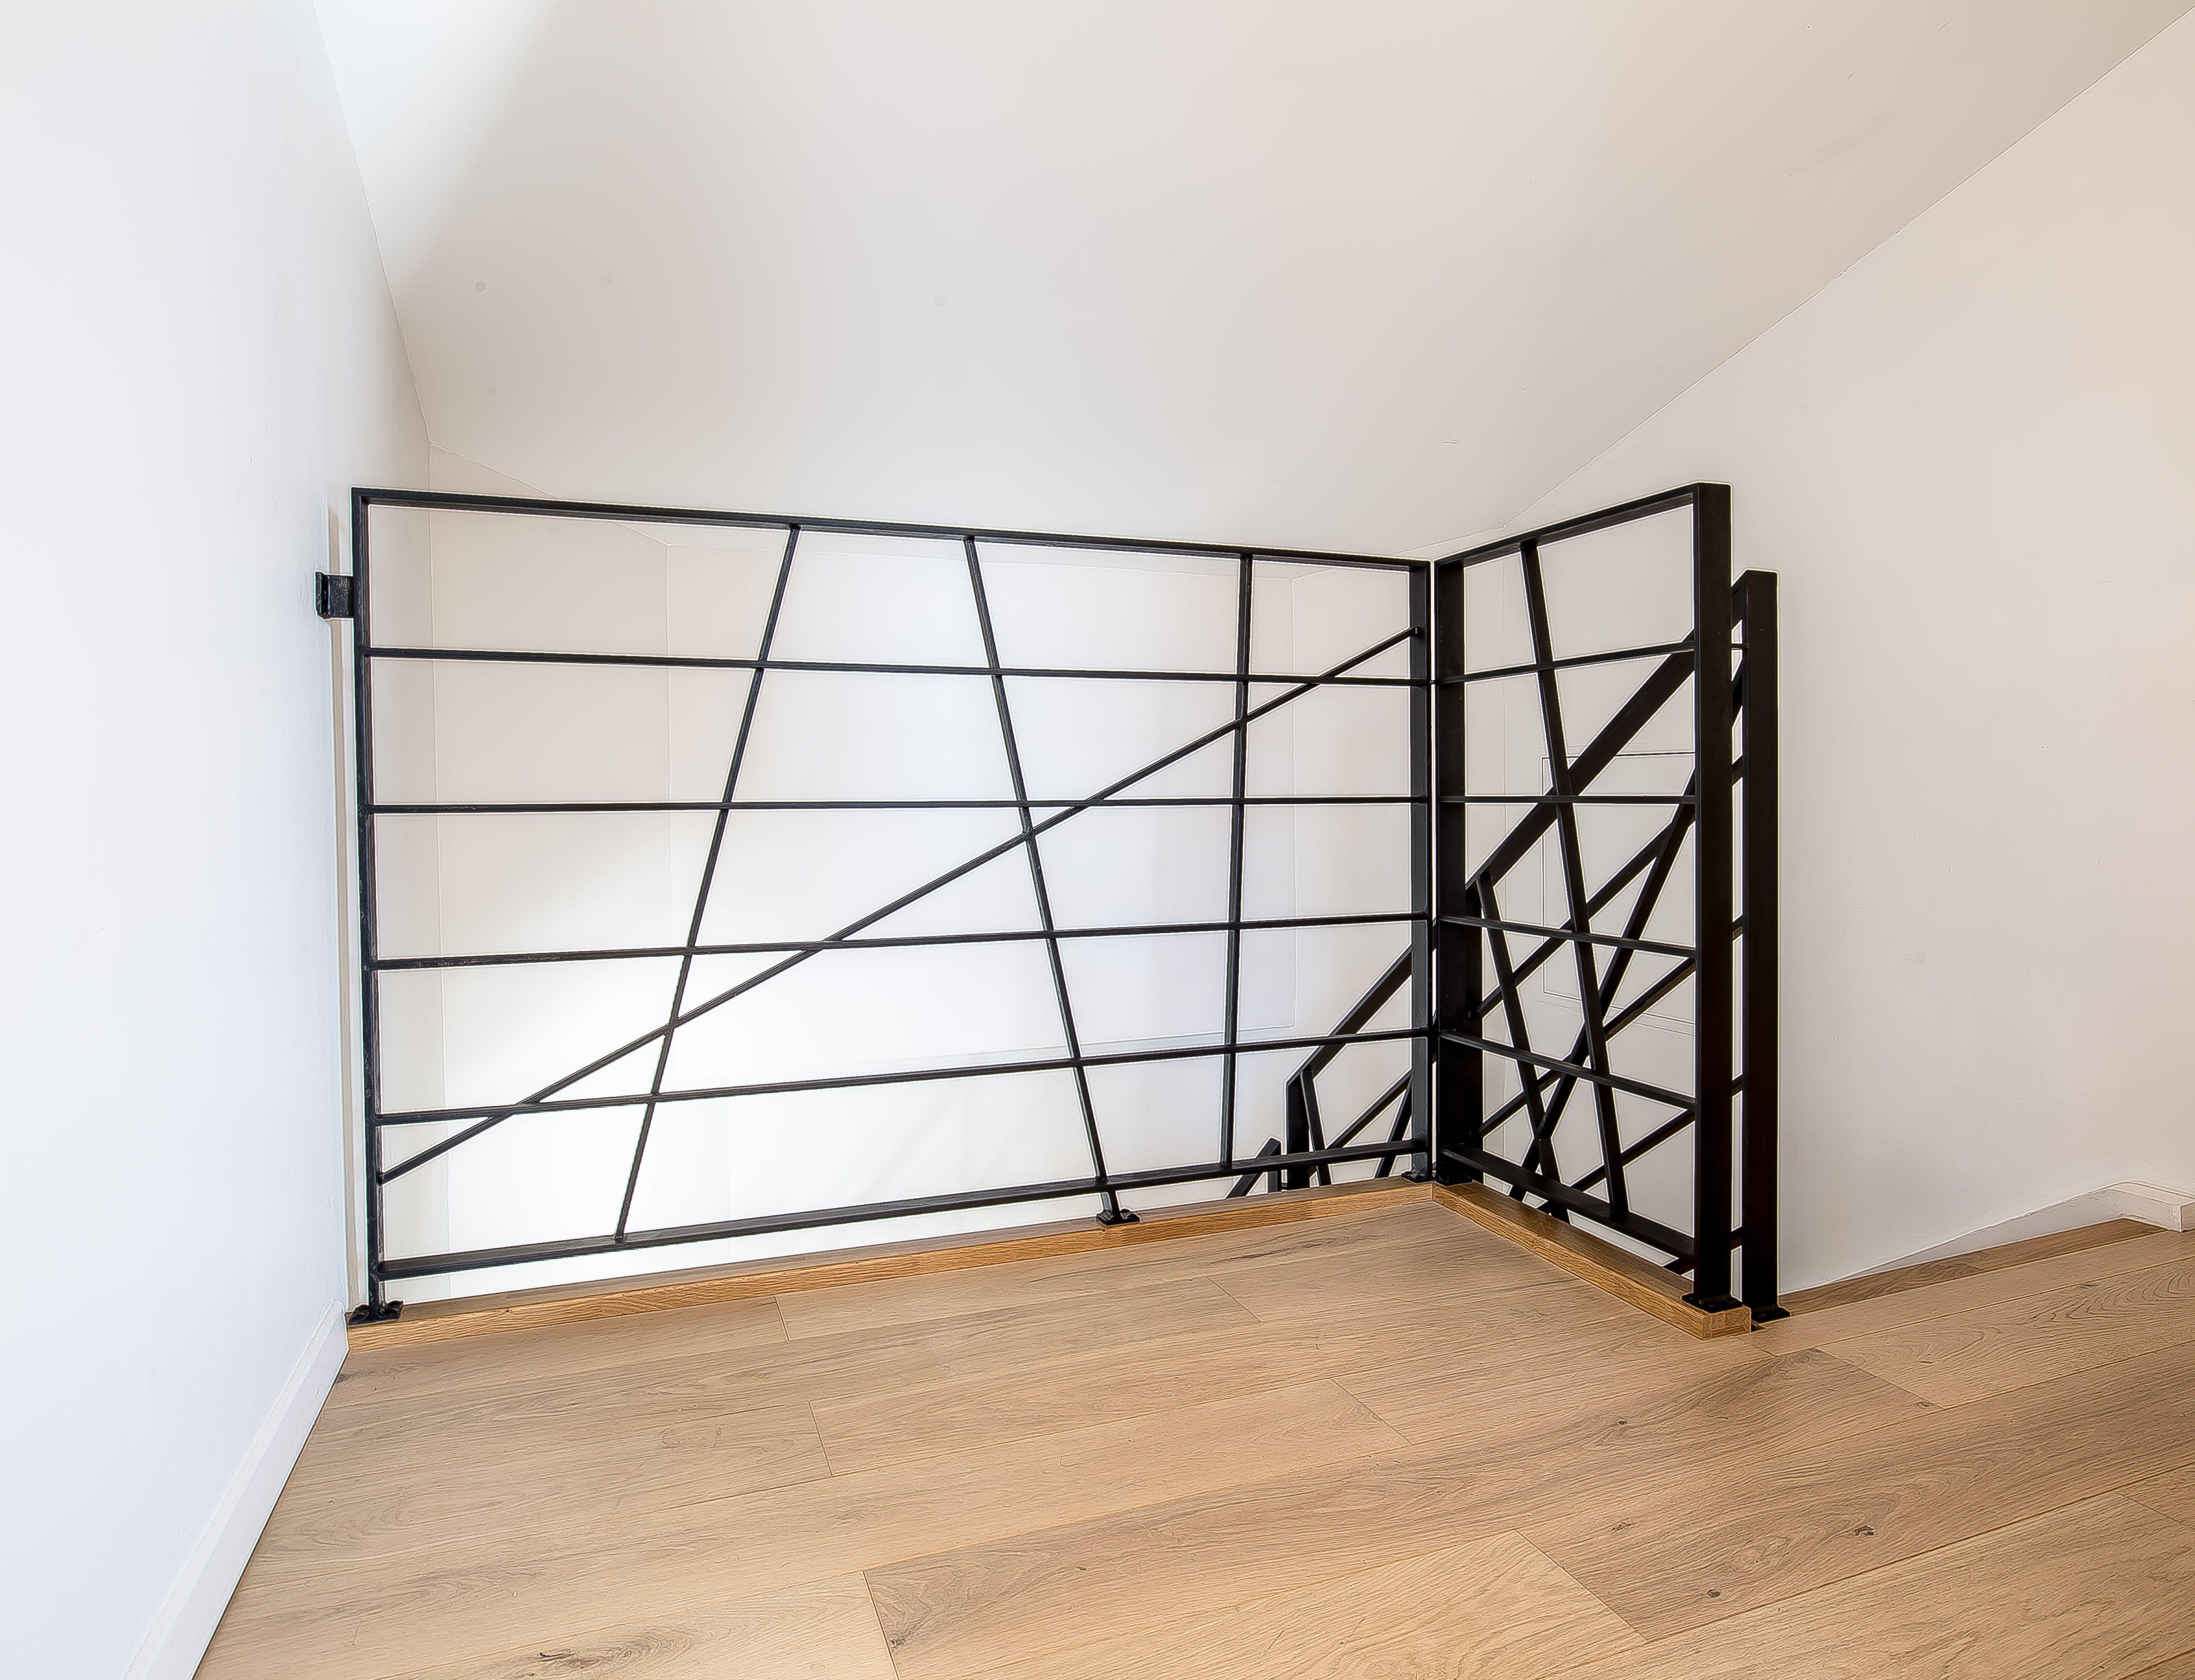 securiser un escalier sans rampe stunning escalier sans rampe with securiser un escalier sans. Black Bedroom Furniture Sets. Home Design Ideas